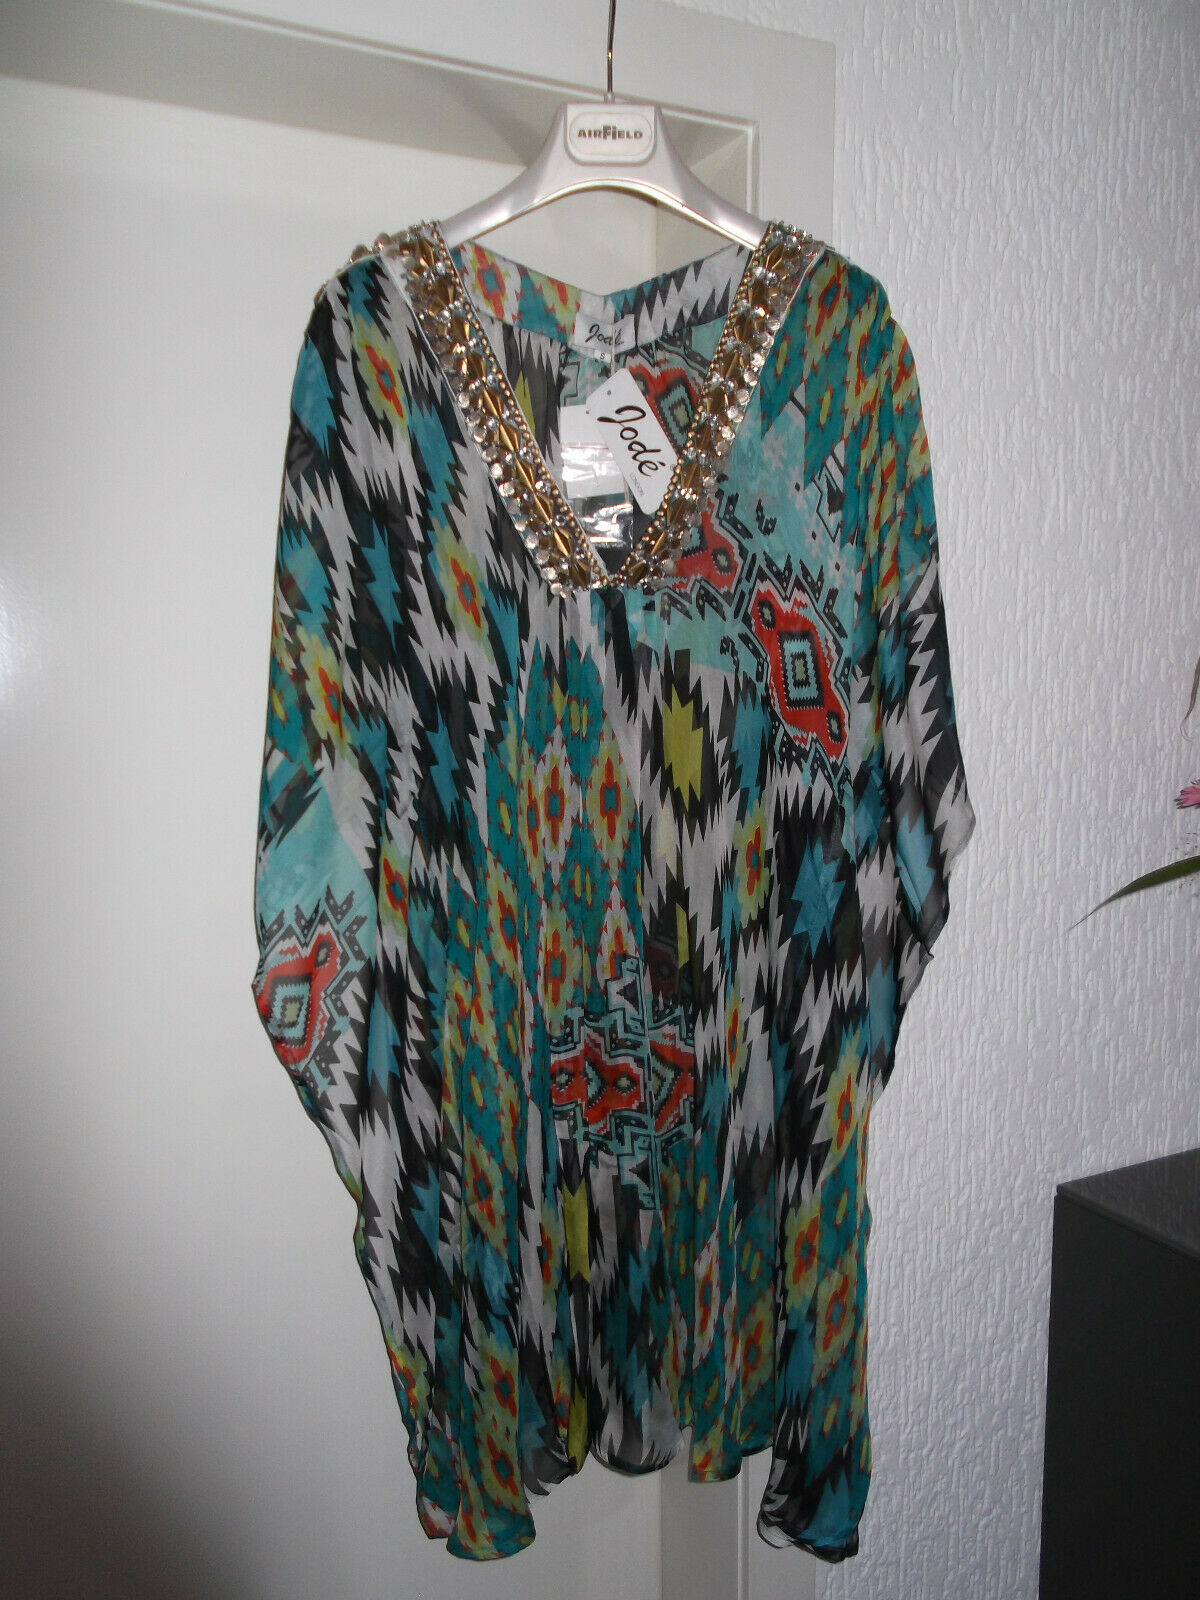 Jodé London Gr. S 36/38 Beachwear Kaftan Tunika Strandkleid Seide NEU m. Etikett